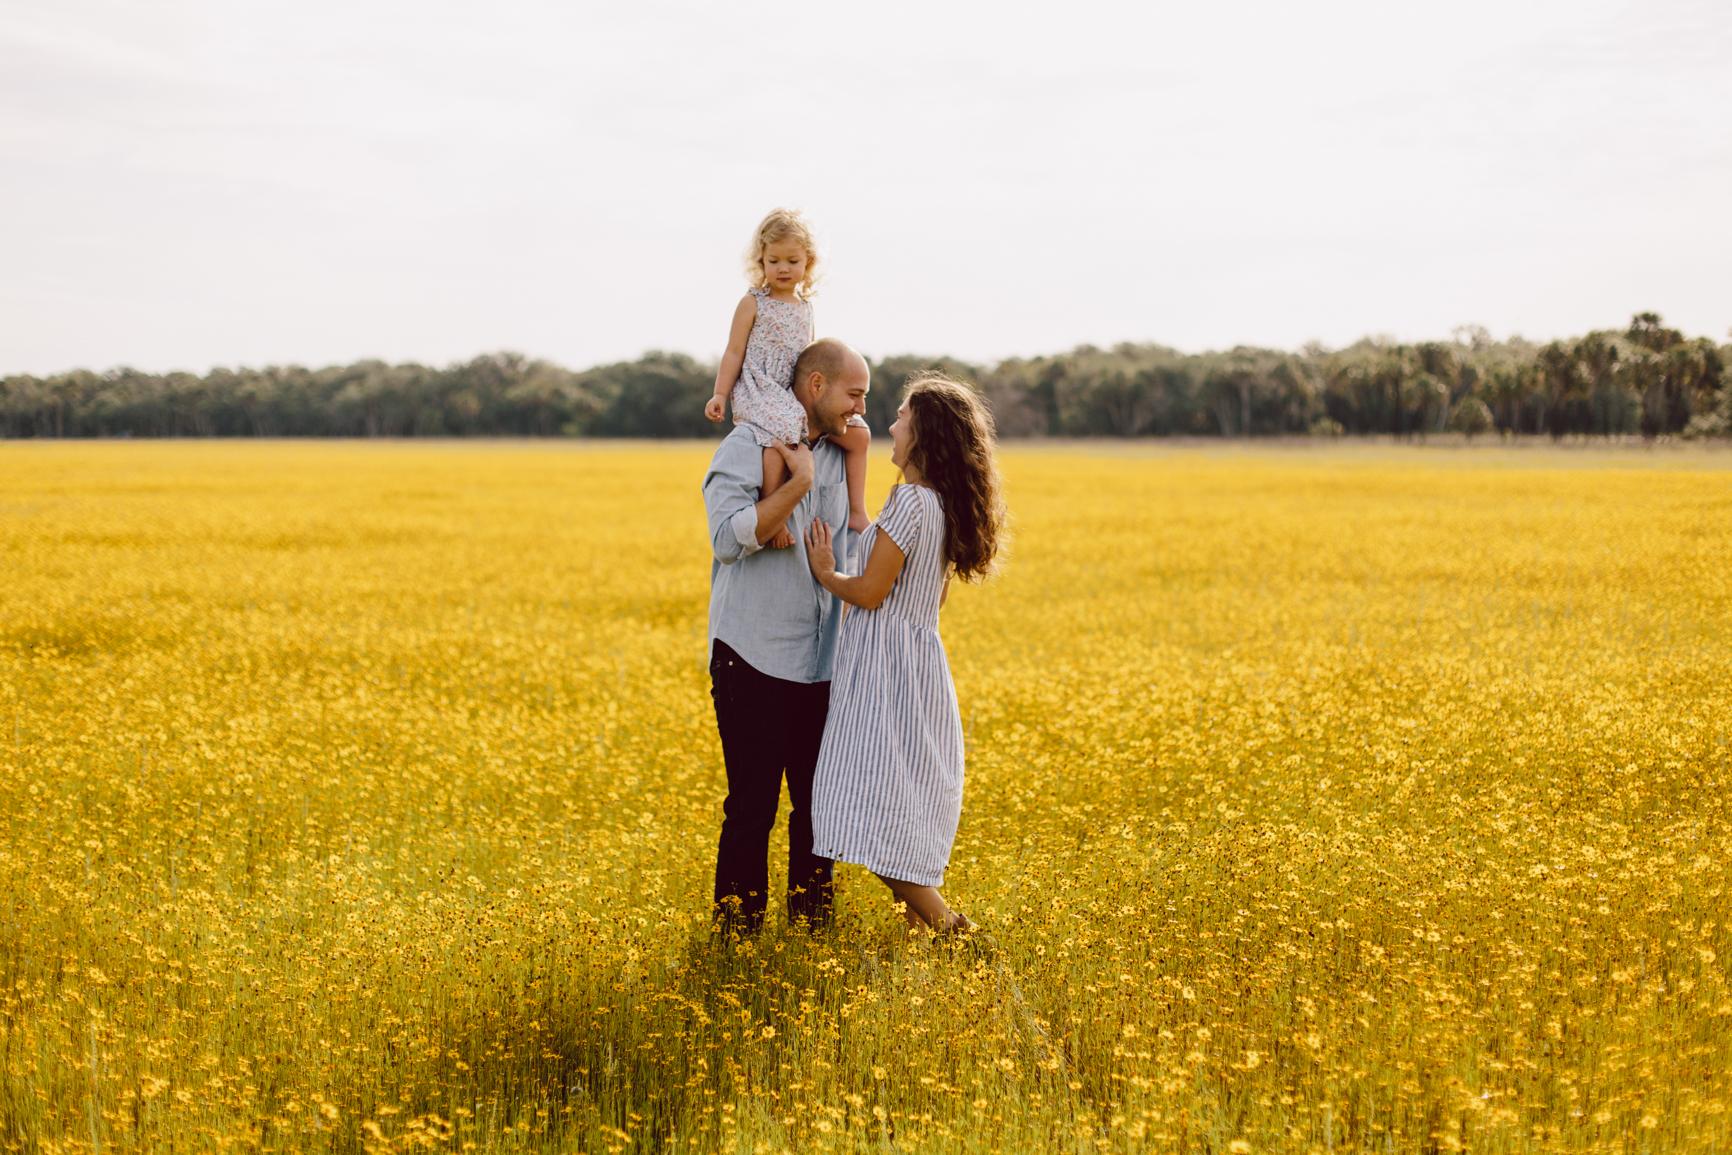 The Yoders | Sarasota Family Photographer — Alyssa Shrock Photography